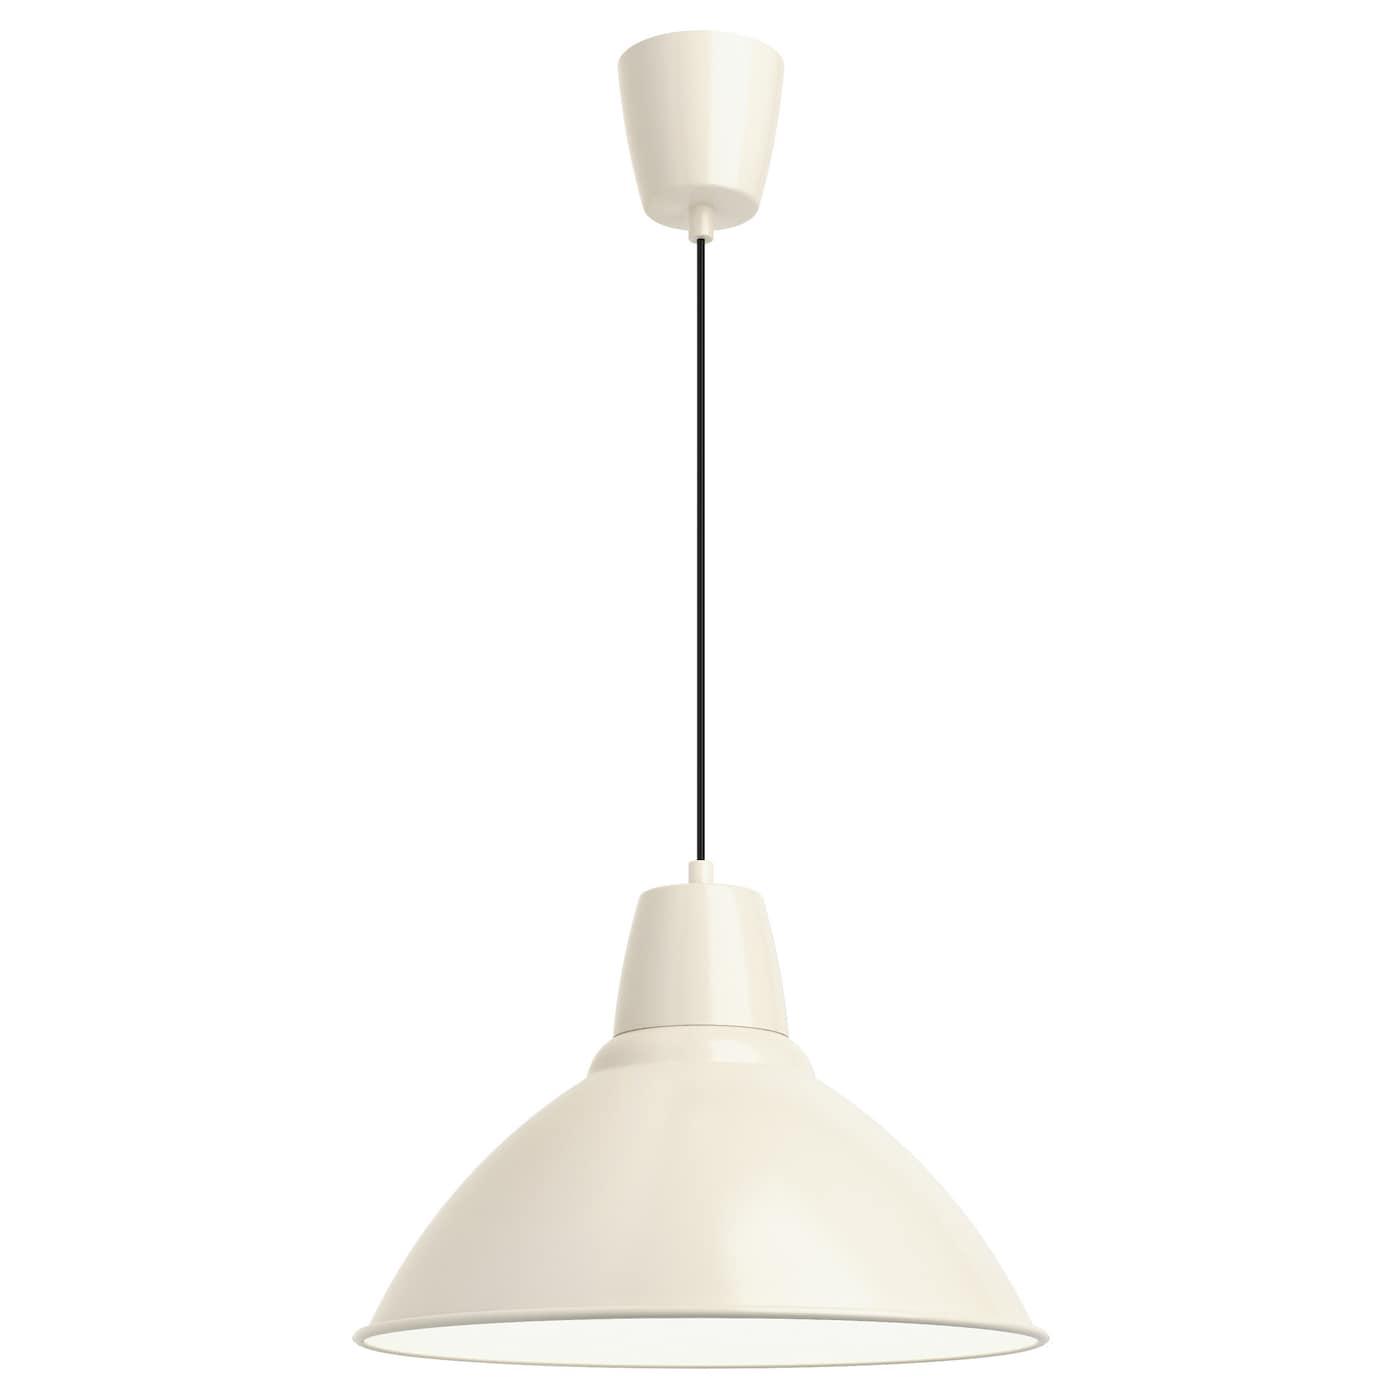 Led ceiling lights shop at ikea ireland ikea foto pendant lamp arubaitofo Image collections